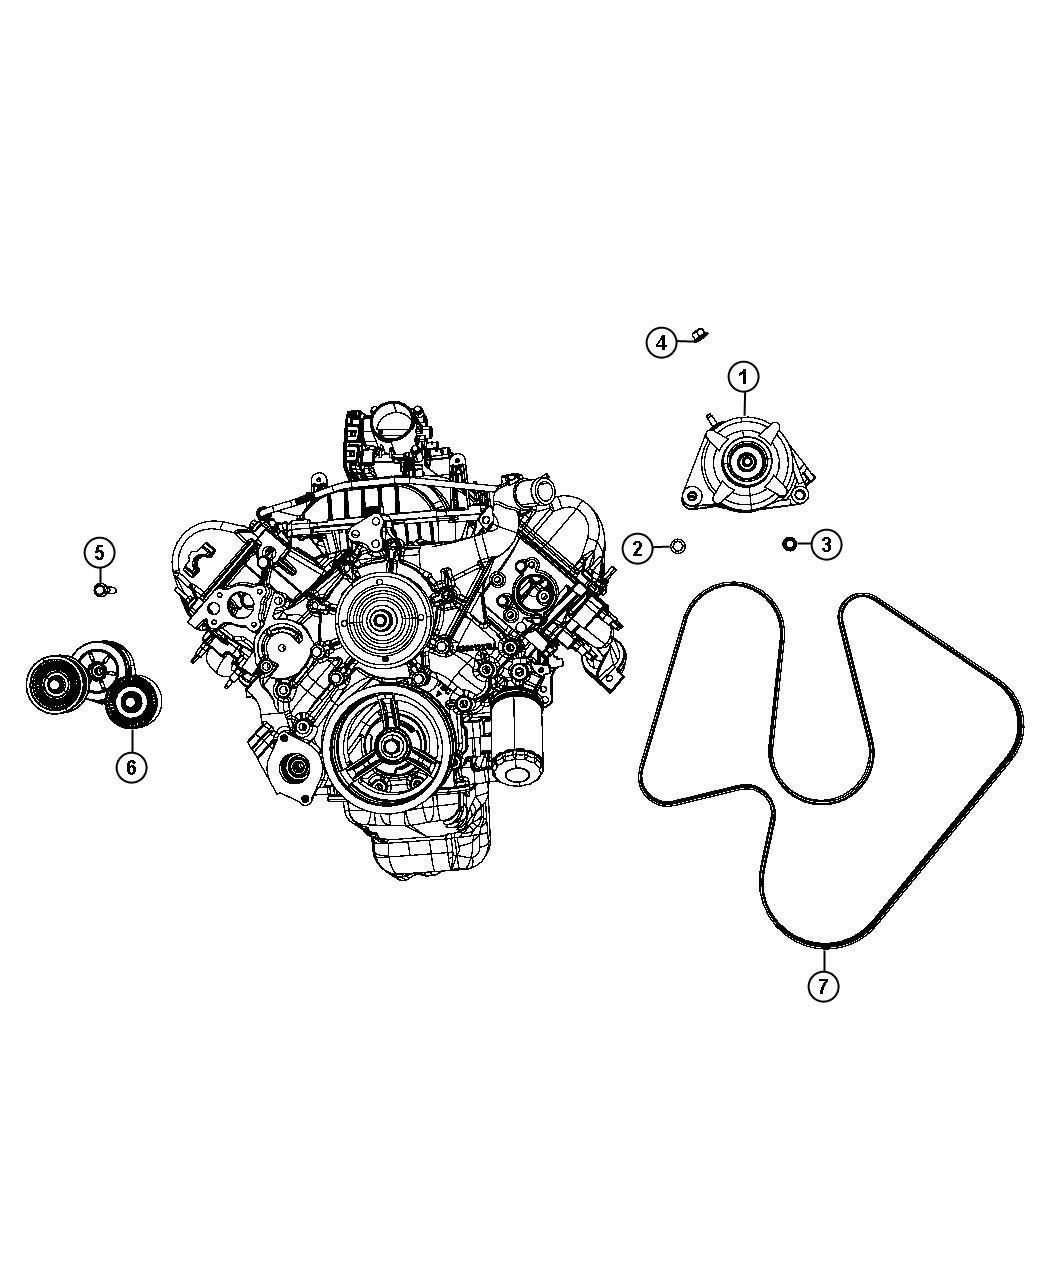 i2239533 Jeep Commander Alternator Wiring Diagram on jeep parts, starter solenoid wiring diagram, jeep wrangler alternator, jeep electrical diagram, jeep starter diagram, jeep exhaust diagram, 3 wire alternator diagram, jeep cherokee alternator, alternator connections diagram, 1-wire alternator diagram, jeep starter relay, jeep voltage regulator diagram, jeep heater diagram, jeep alternator repair, alternator schematic diagram, 4 wire alternator diagram, jeep alternator connector, jeep alternator generator, jeep seat belt diagram, jeep steering column diagram,